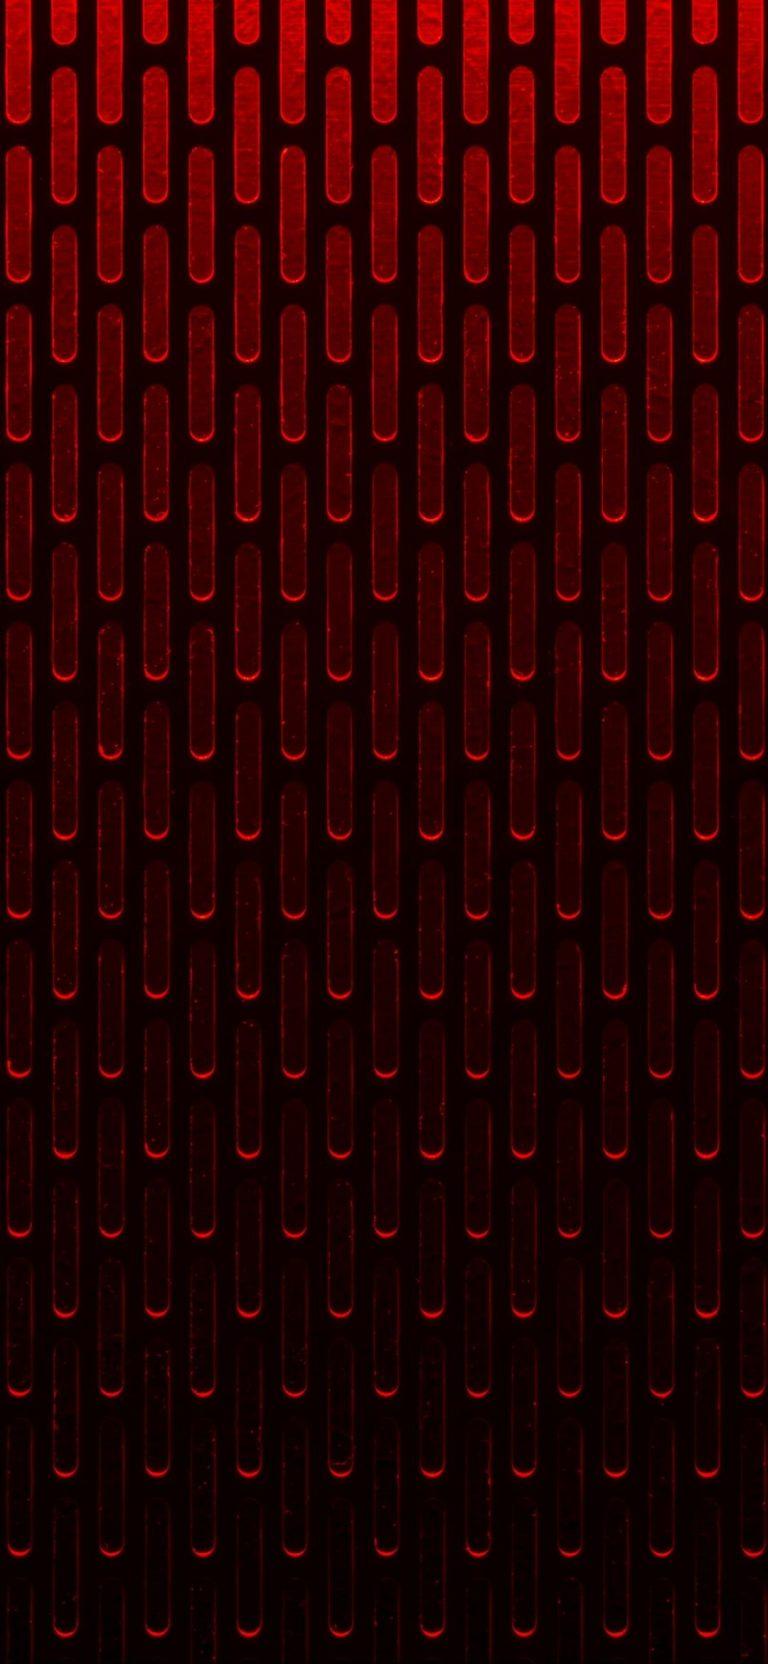 WhatsApp Background Wallpaper 08 768x1664 - WhatsApp Background Wallpaper - 08